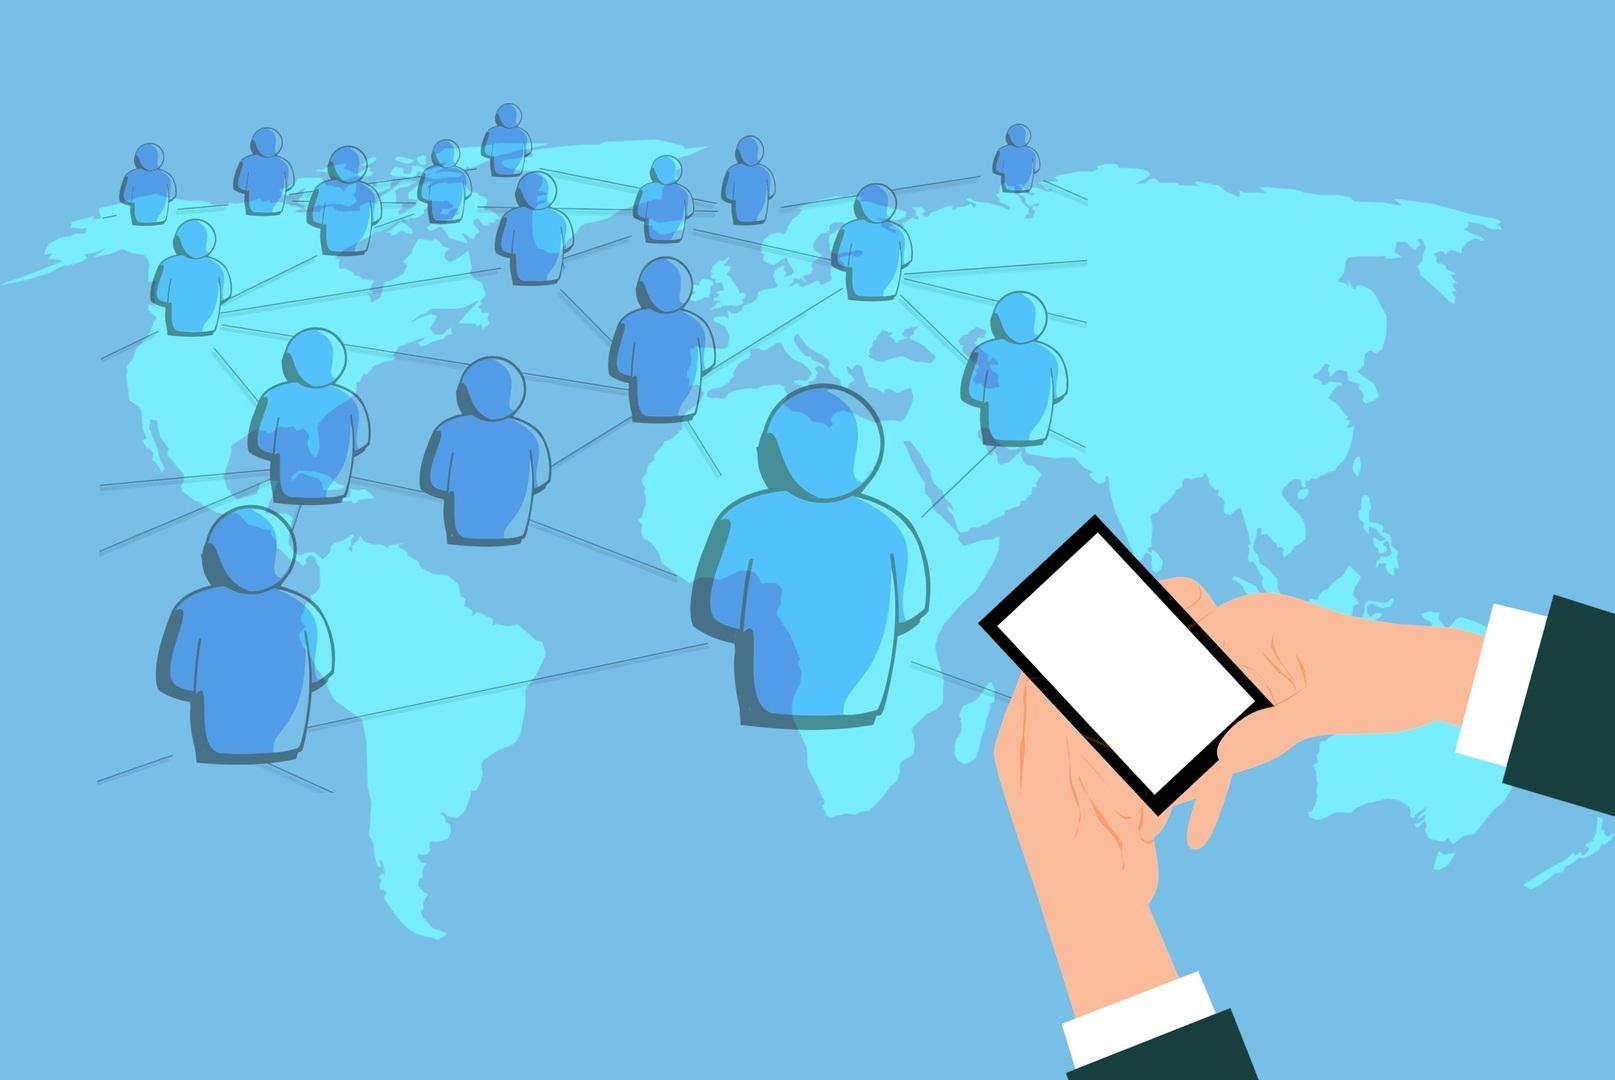 network digital marketing share mobile social media avatar 1451419 pxhere.com  - Avasant Research Bytes